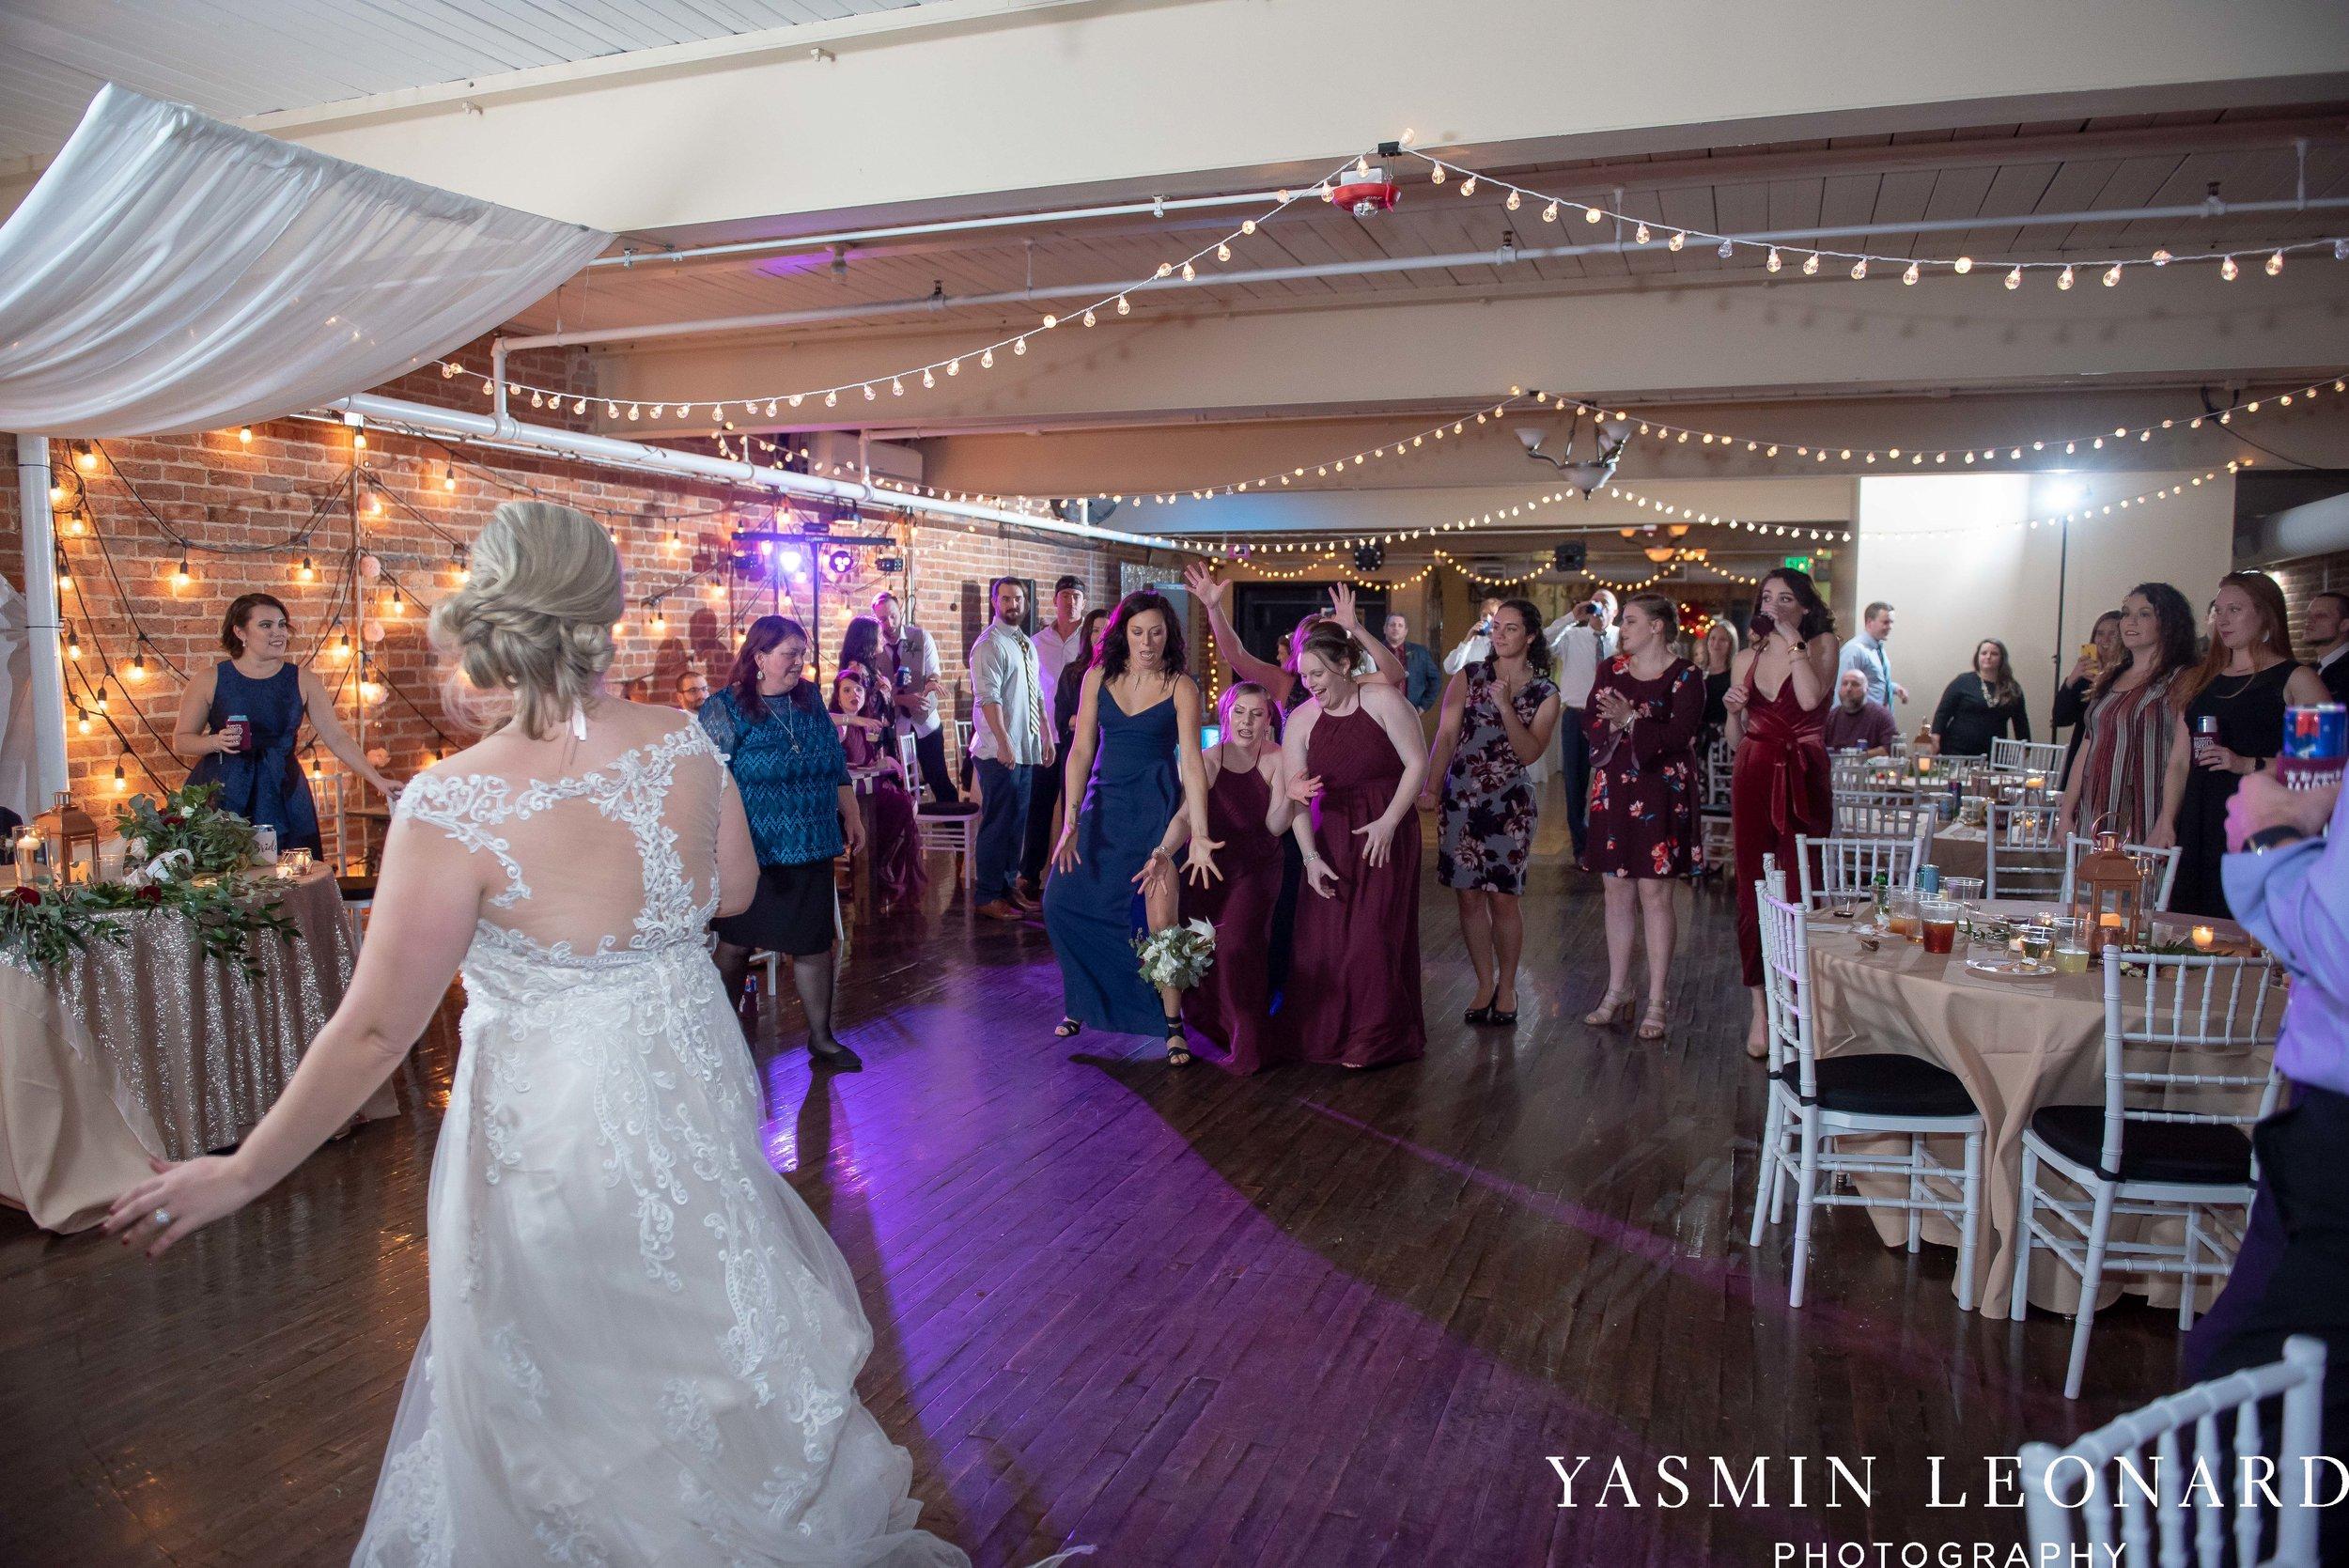 Rebekah and Matt - 105 Worth Event Centre - Yasmin Leonard Photography - Asheboro Wedding - NC Wedding - High Point Weddings - Triad Weddings - Winter Wedding-66.jpg